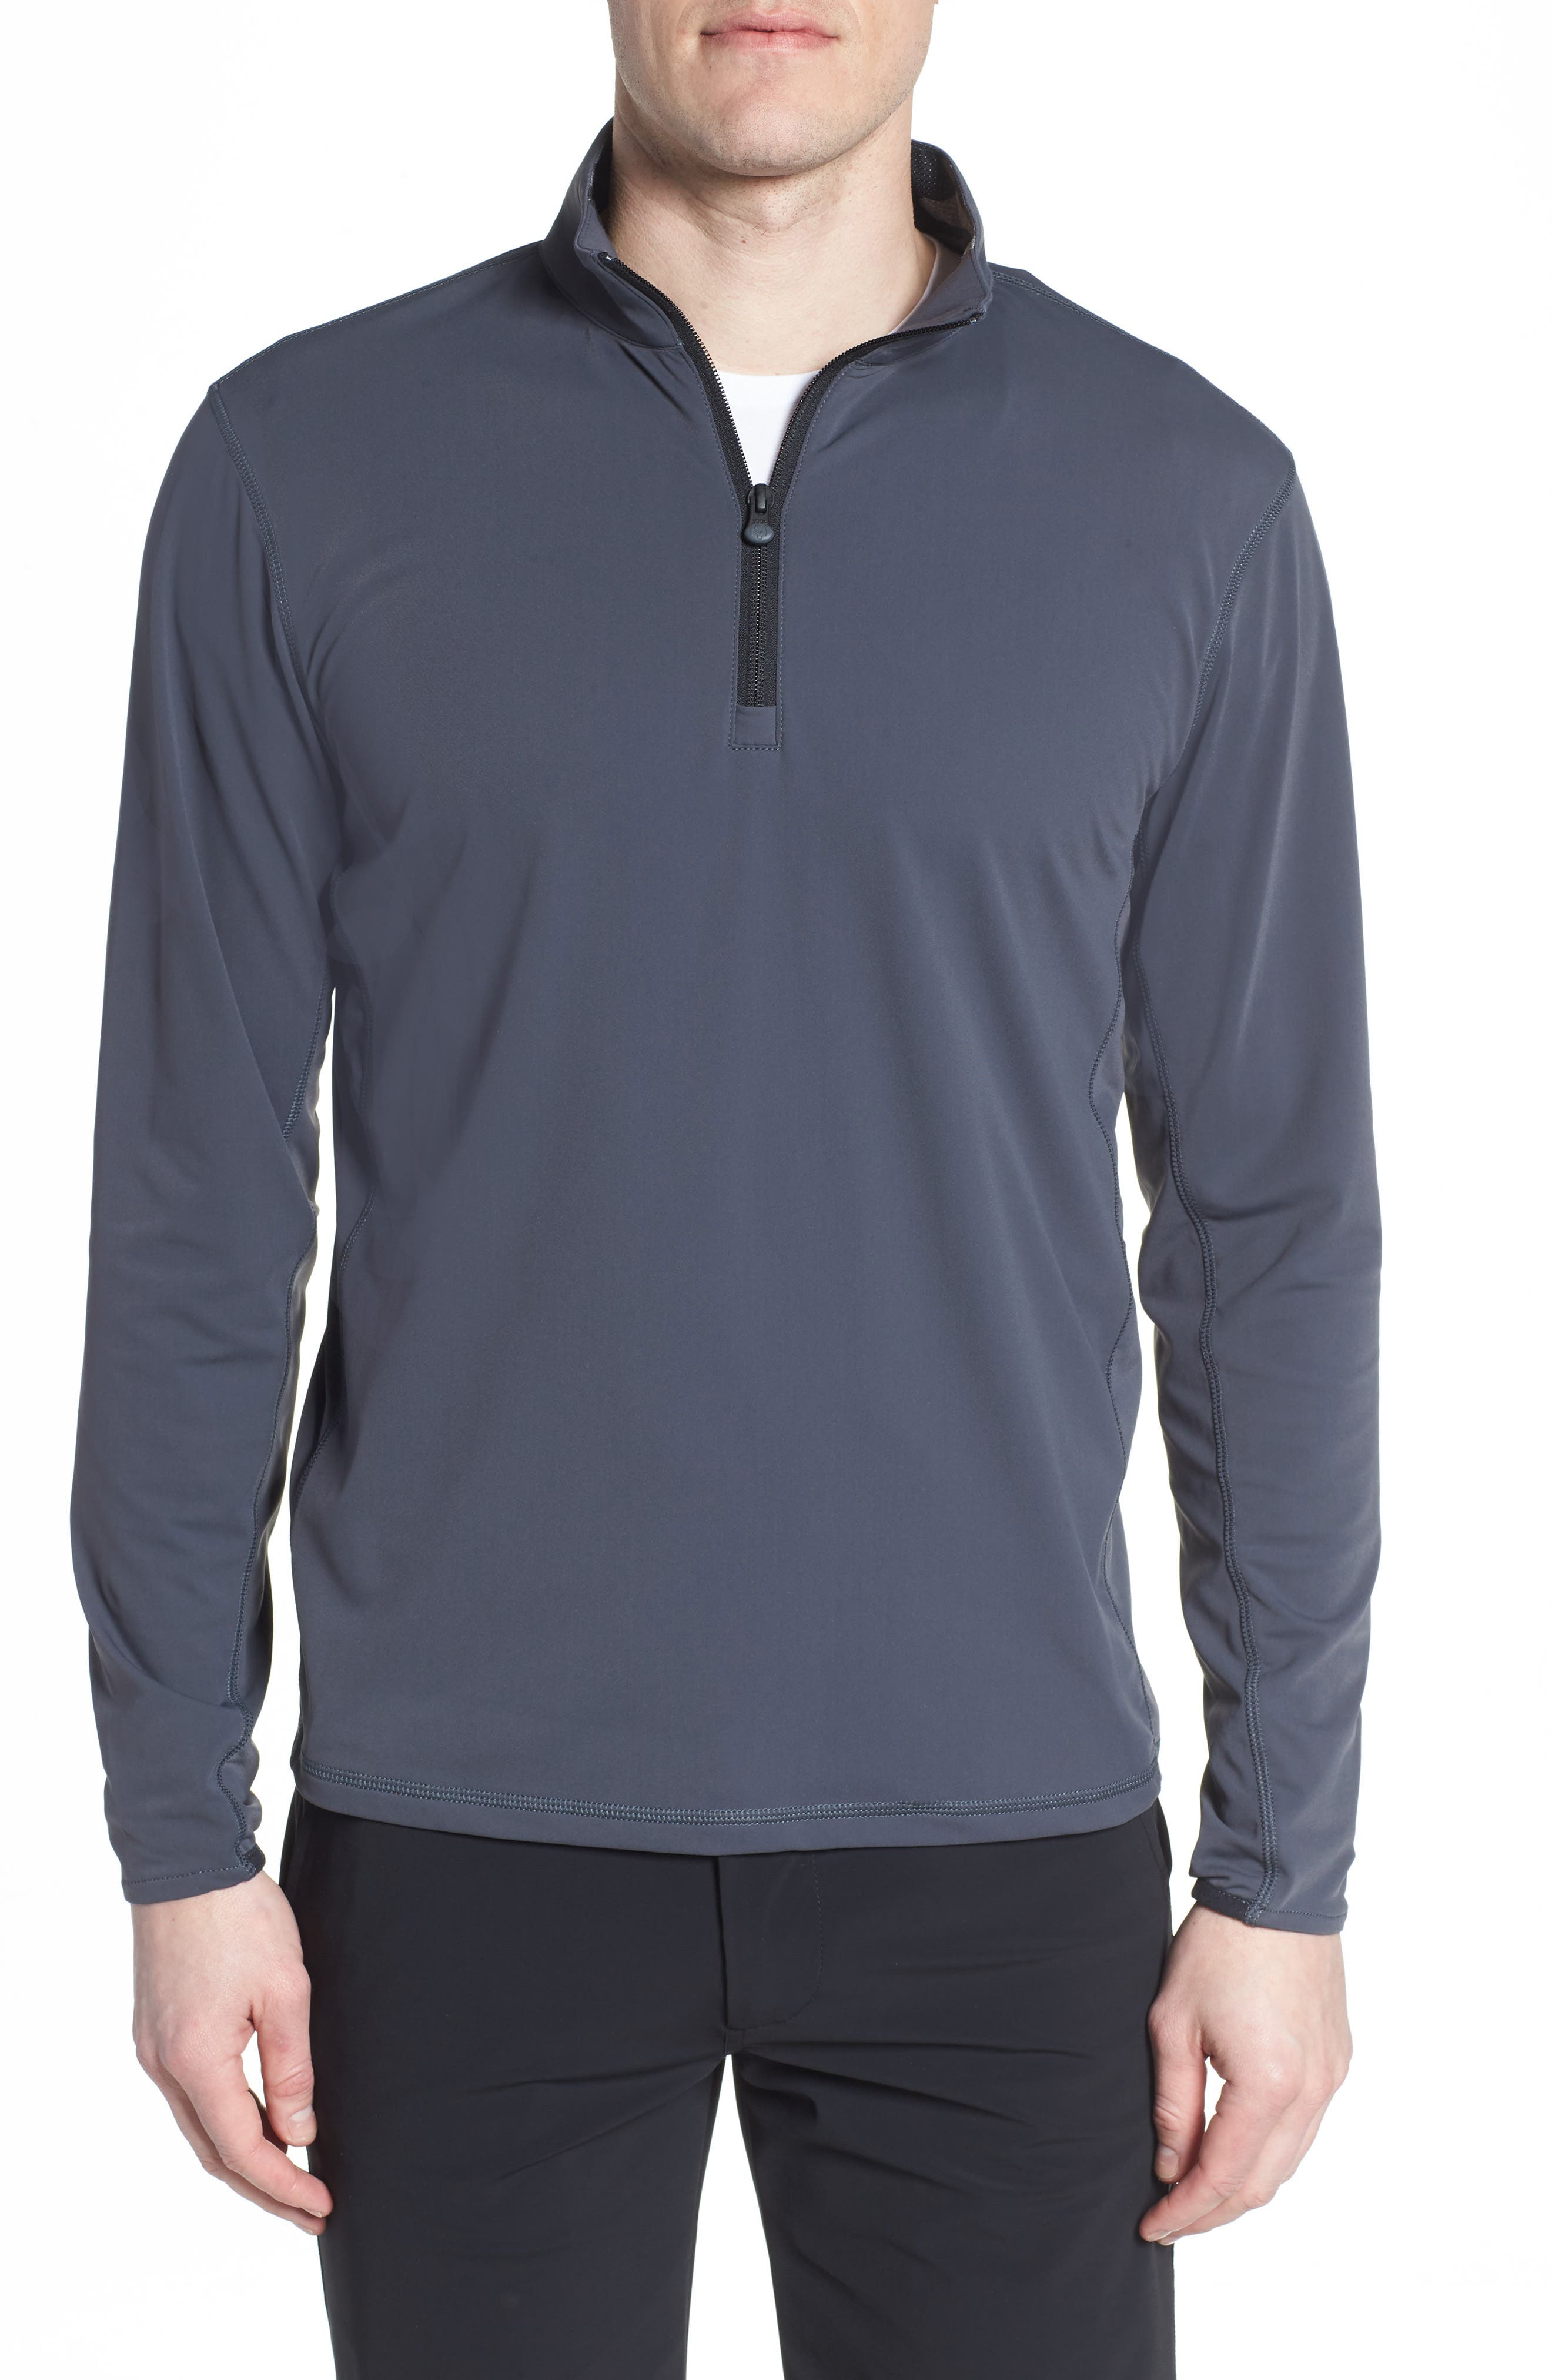 GREYSON Tate Quarter Zip Pullover, Main, color, 020